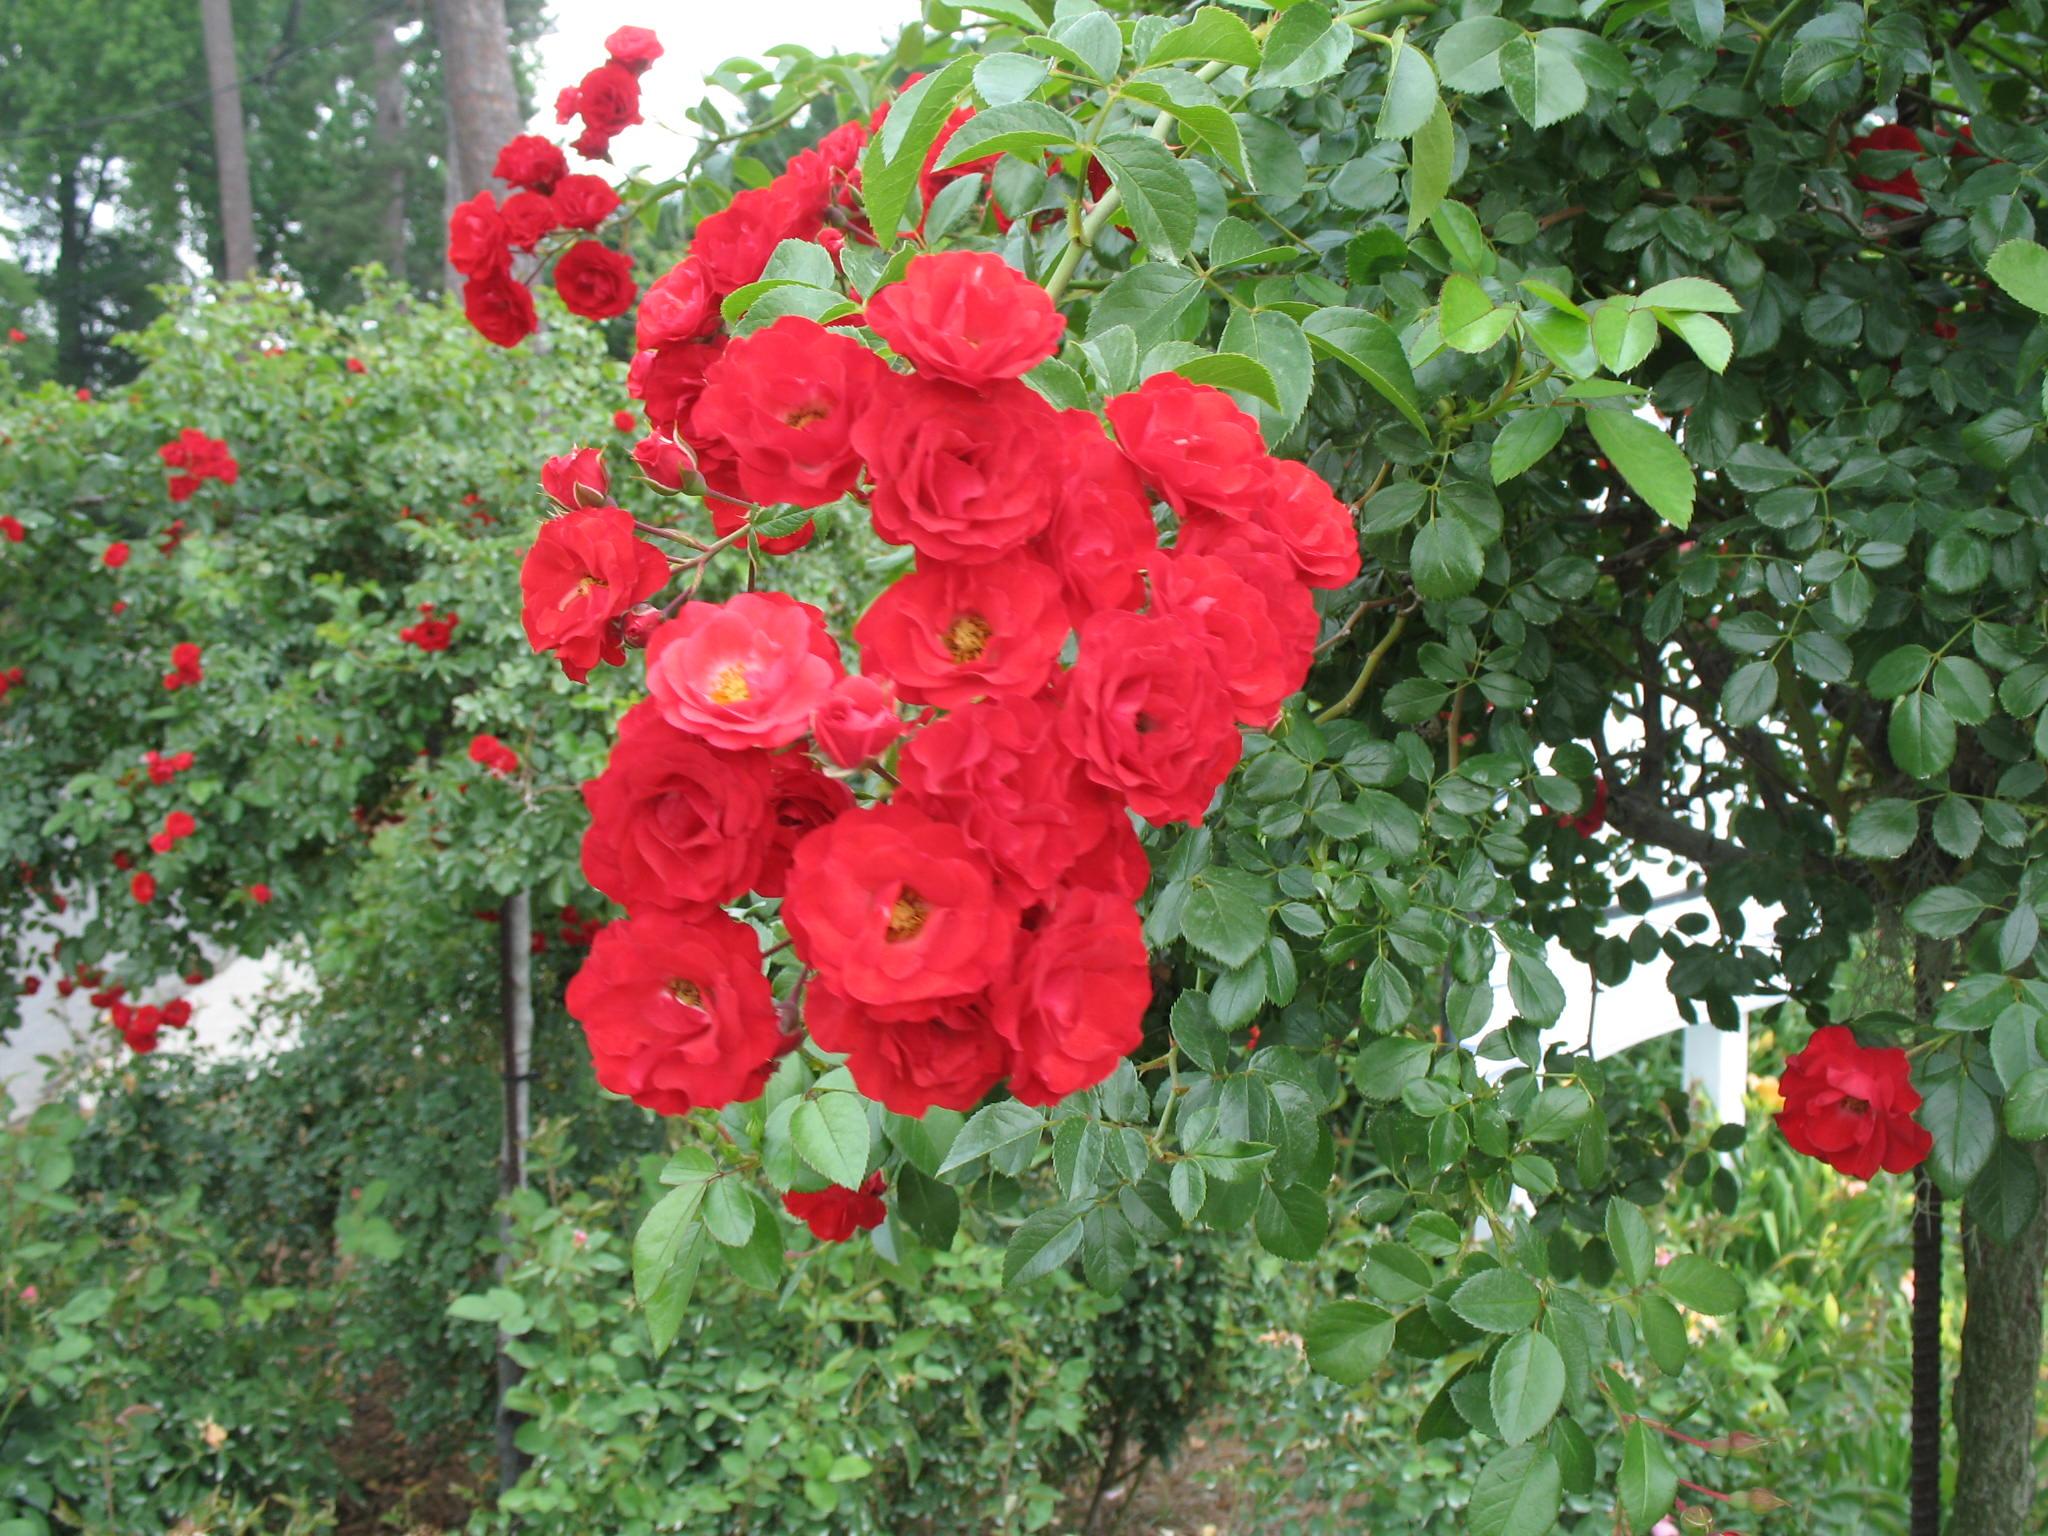 Rosa 'Scarlet Meidland'  / Rosa 'Scarlet Meidland'